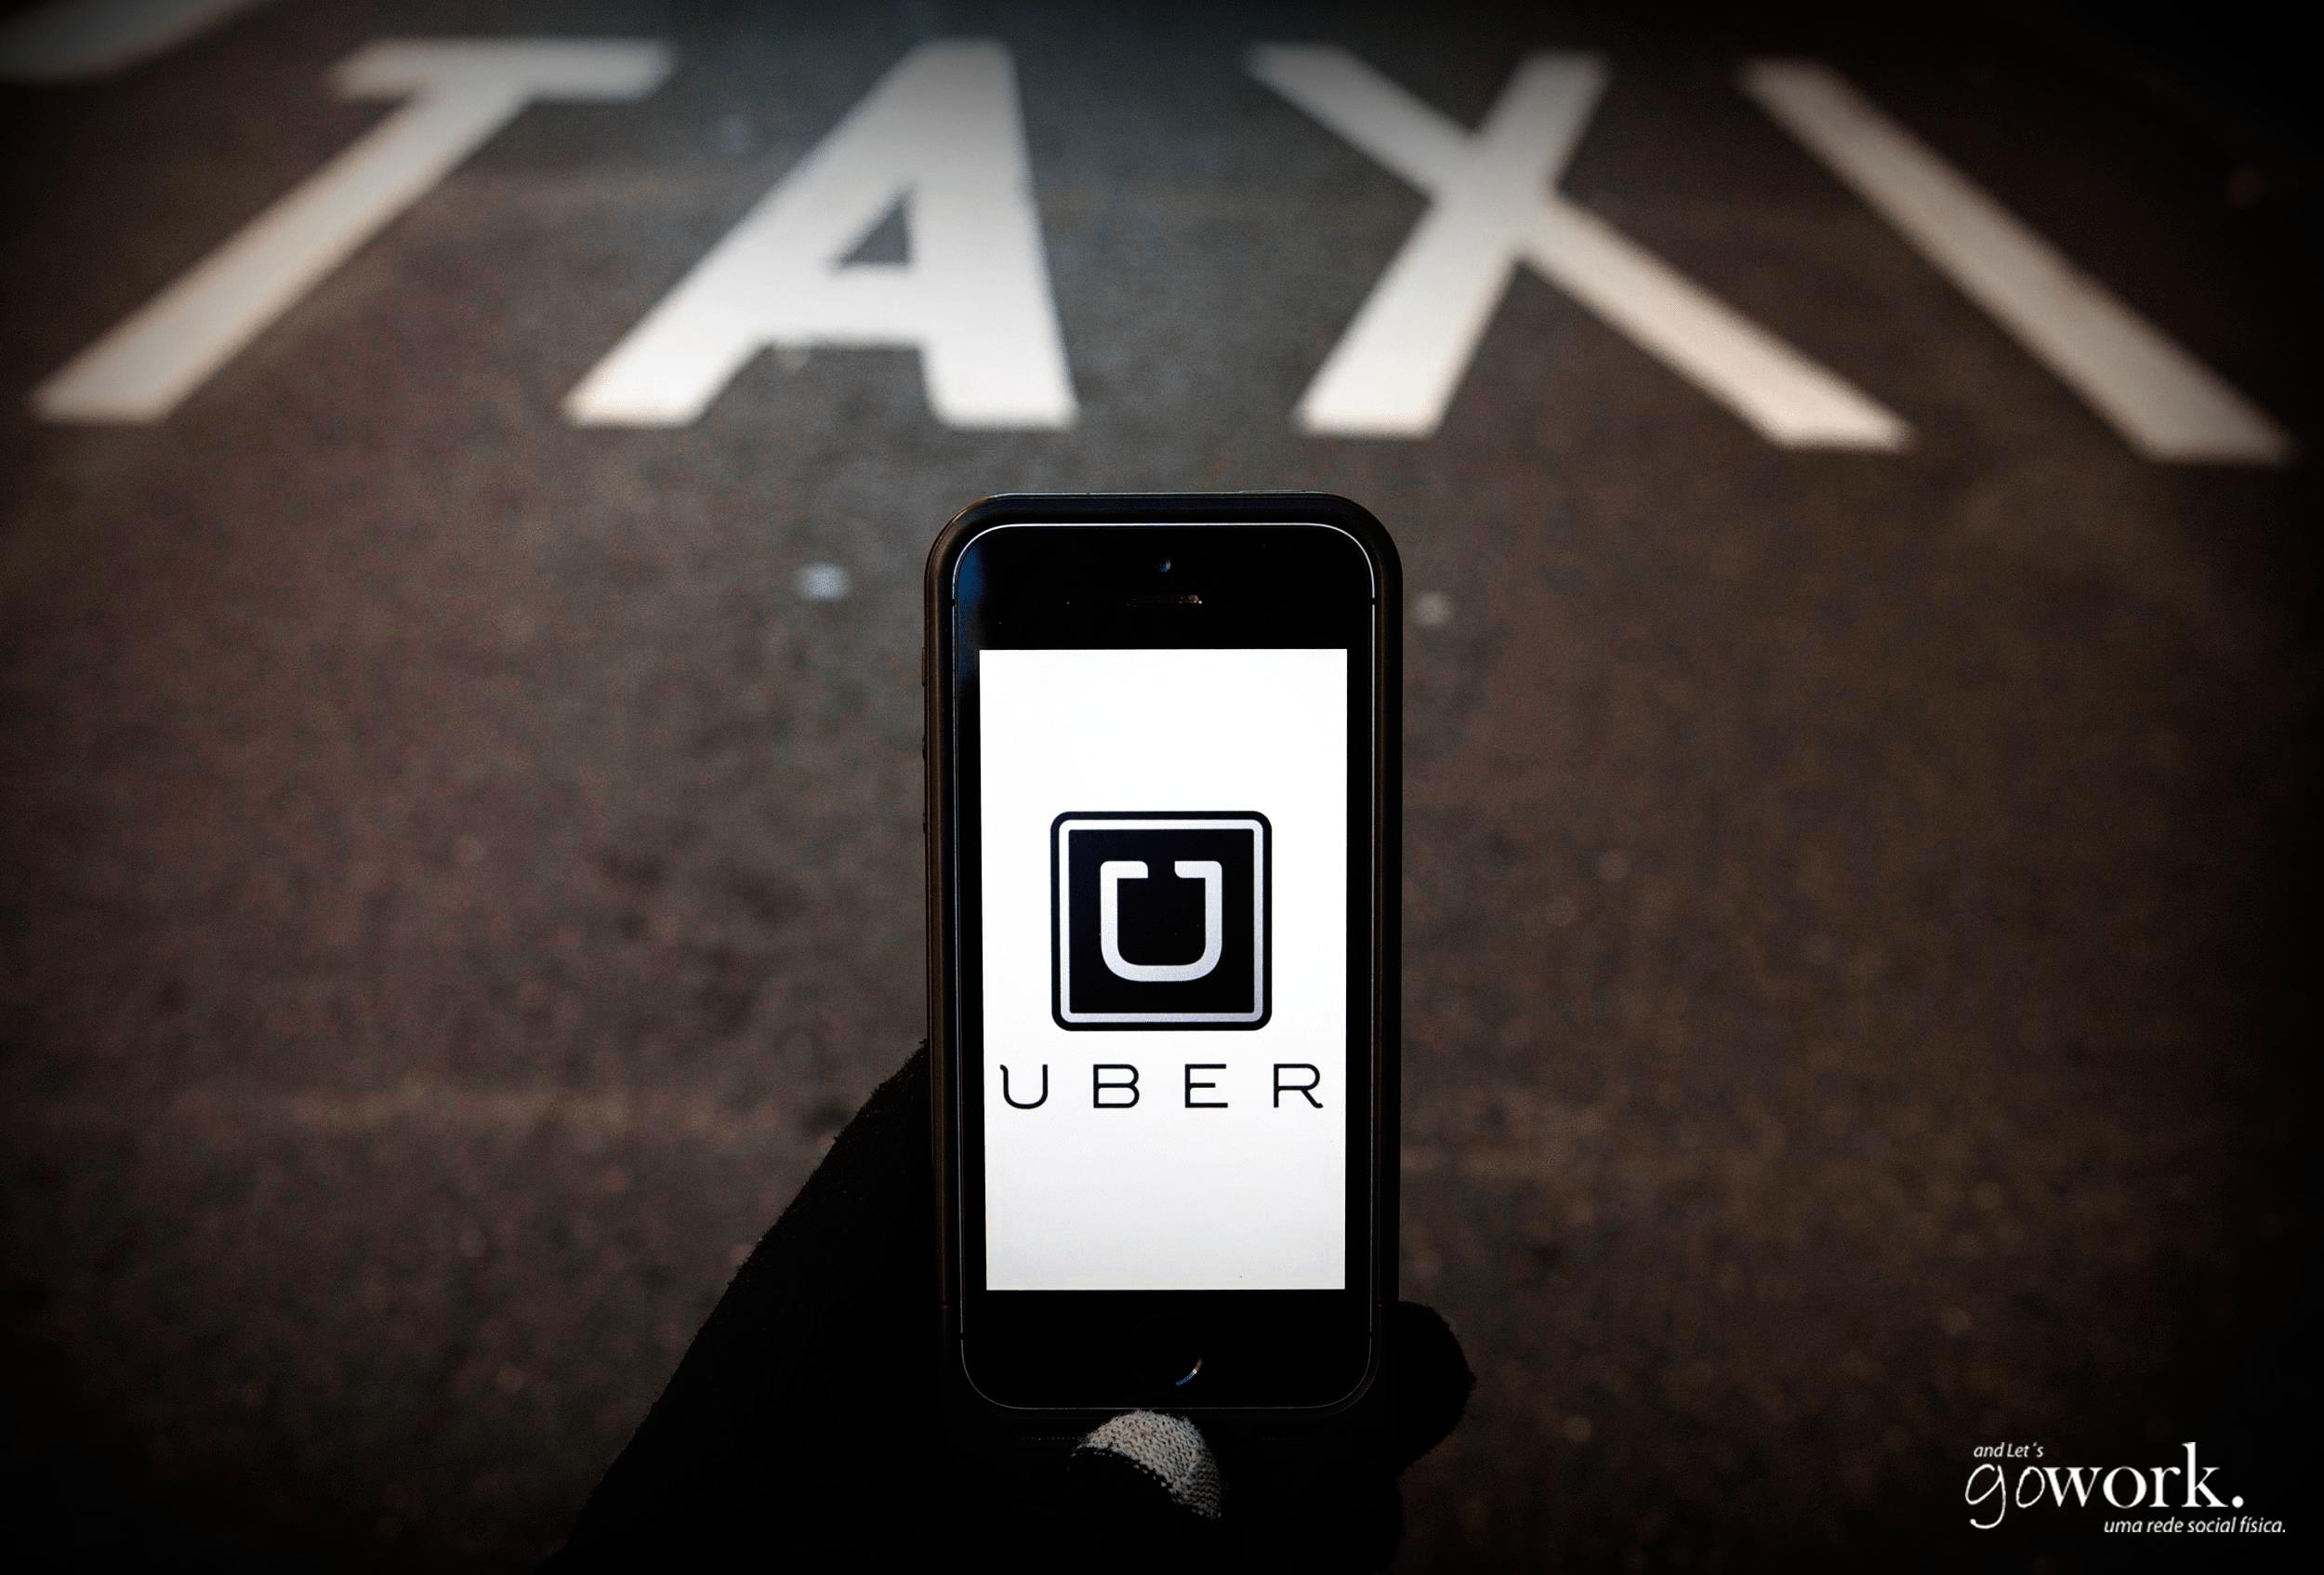 Coworking-Gowork-Startup-SP-Uber